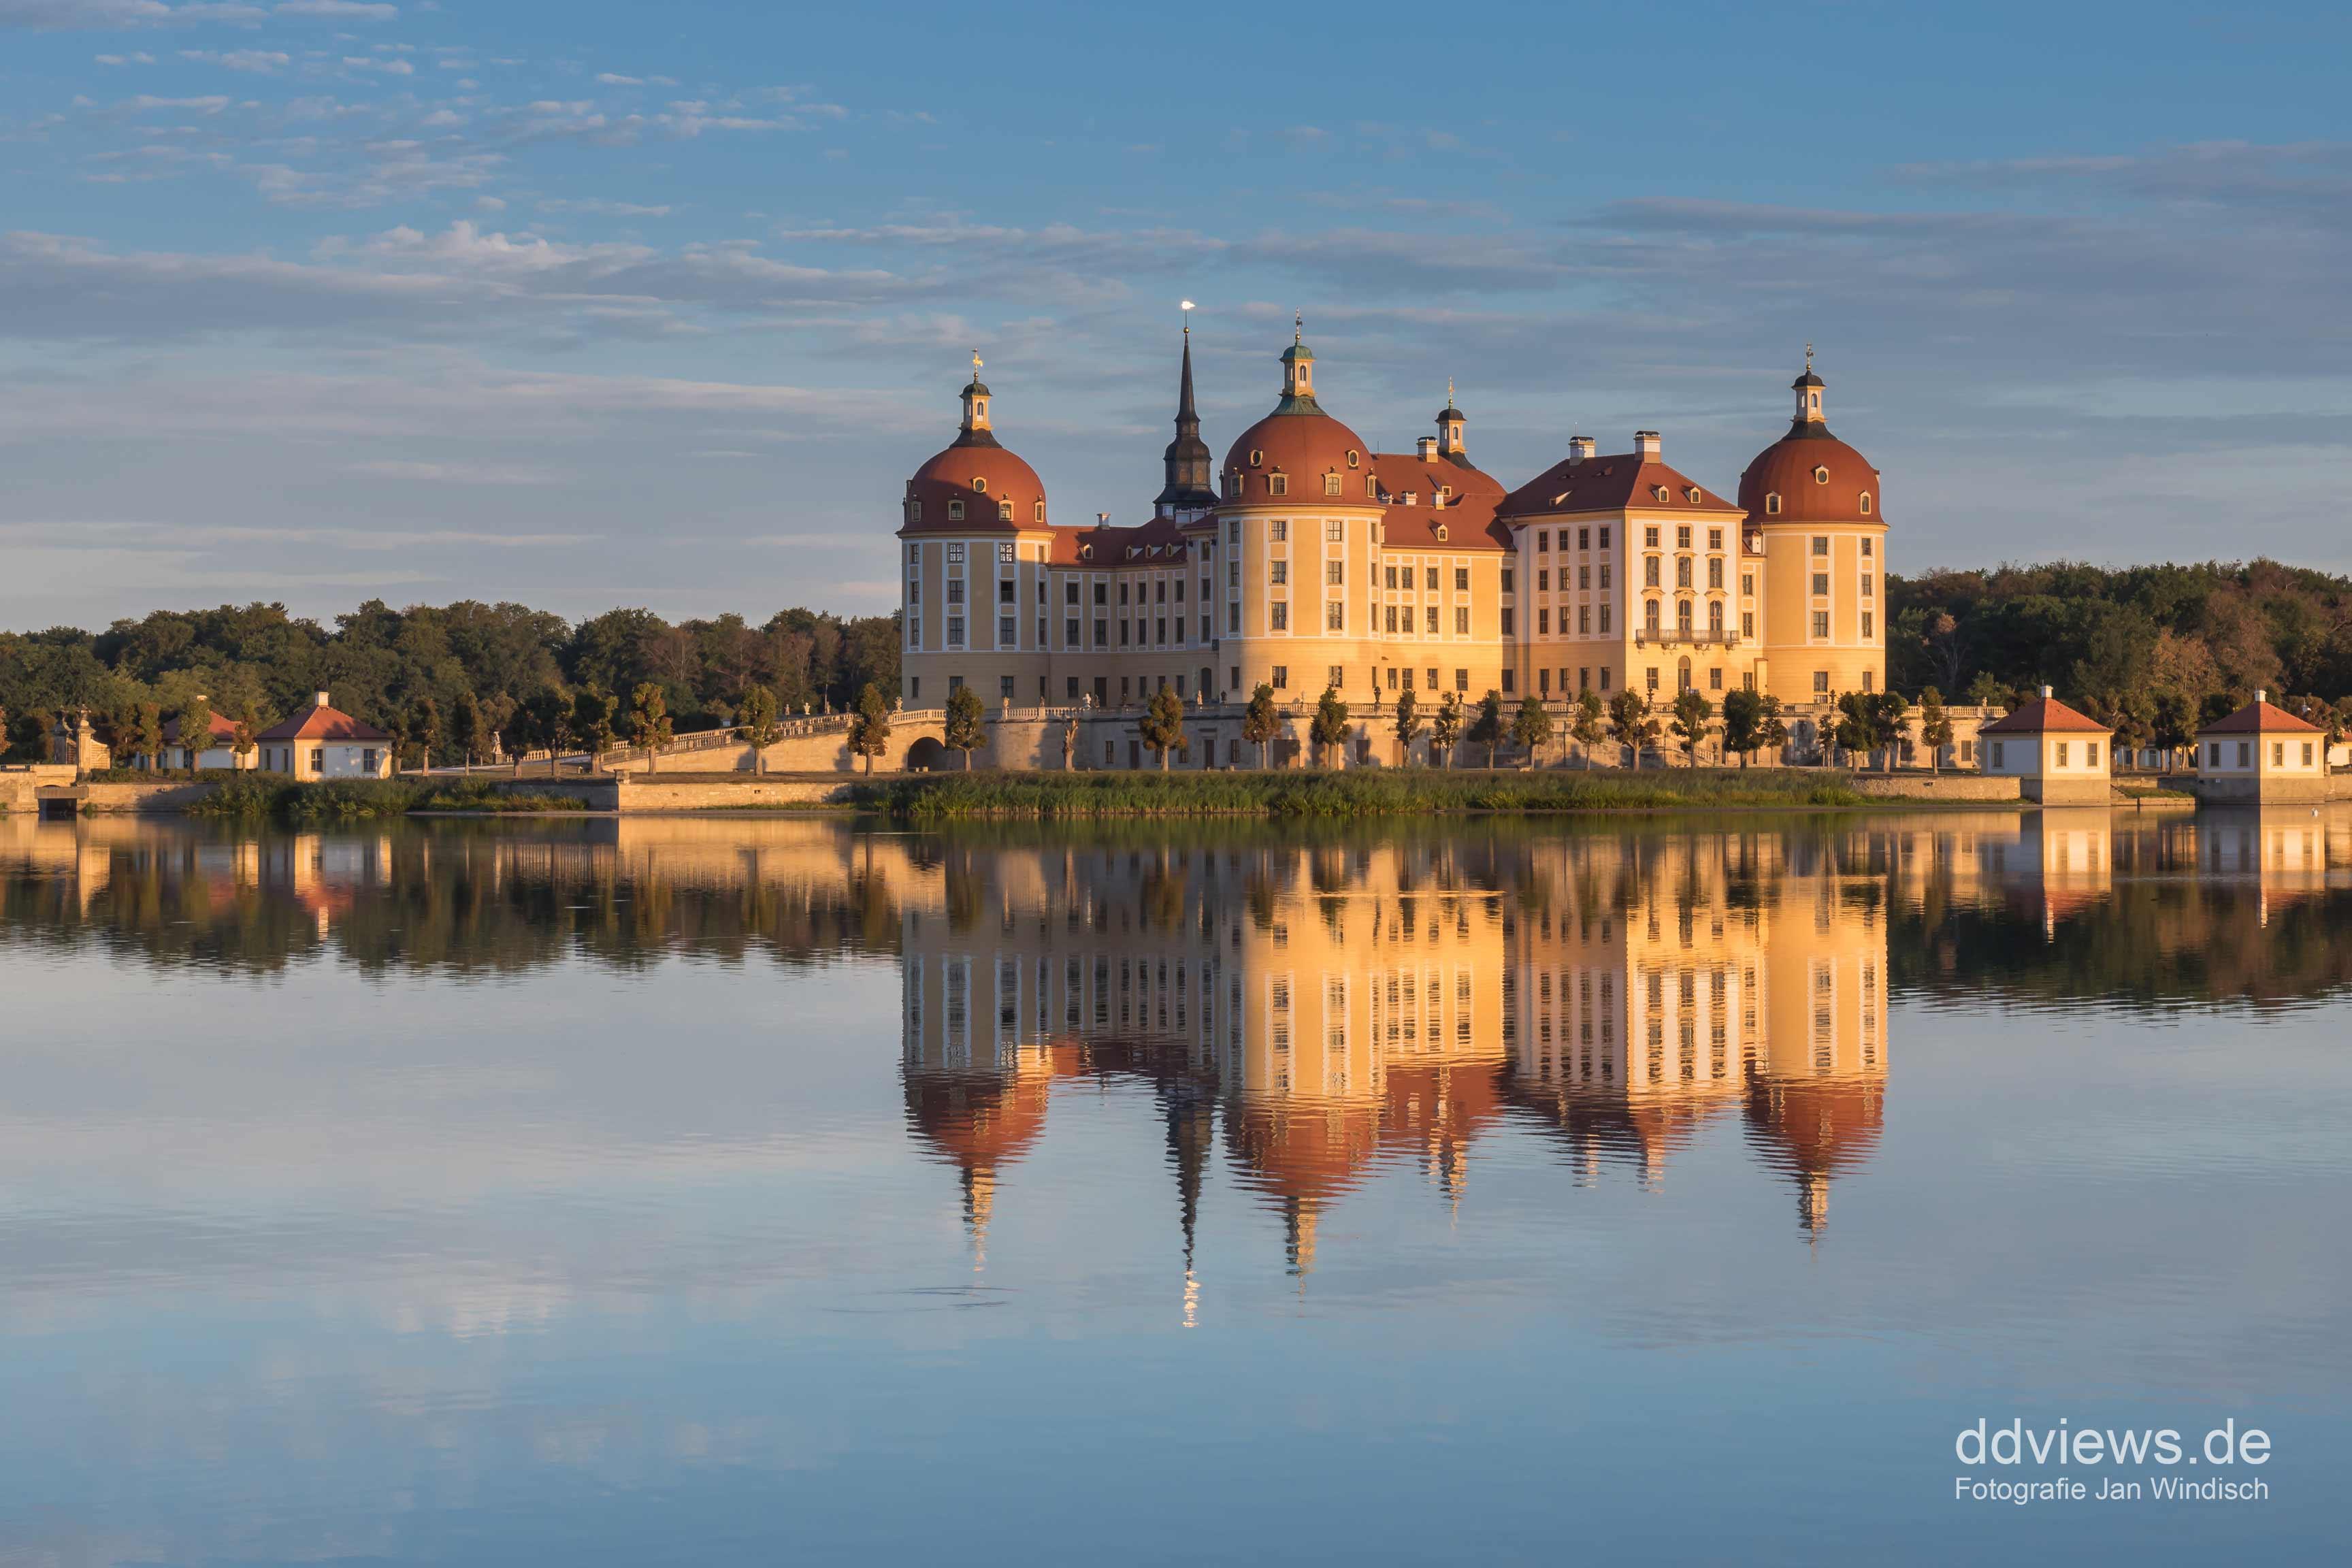 Moritzburg zum Sonnenaufgang im Sommer